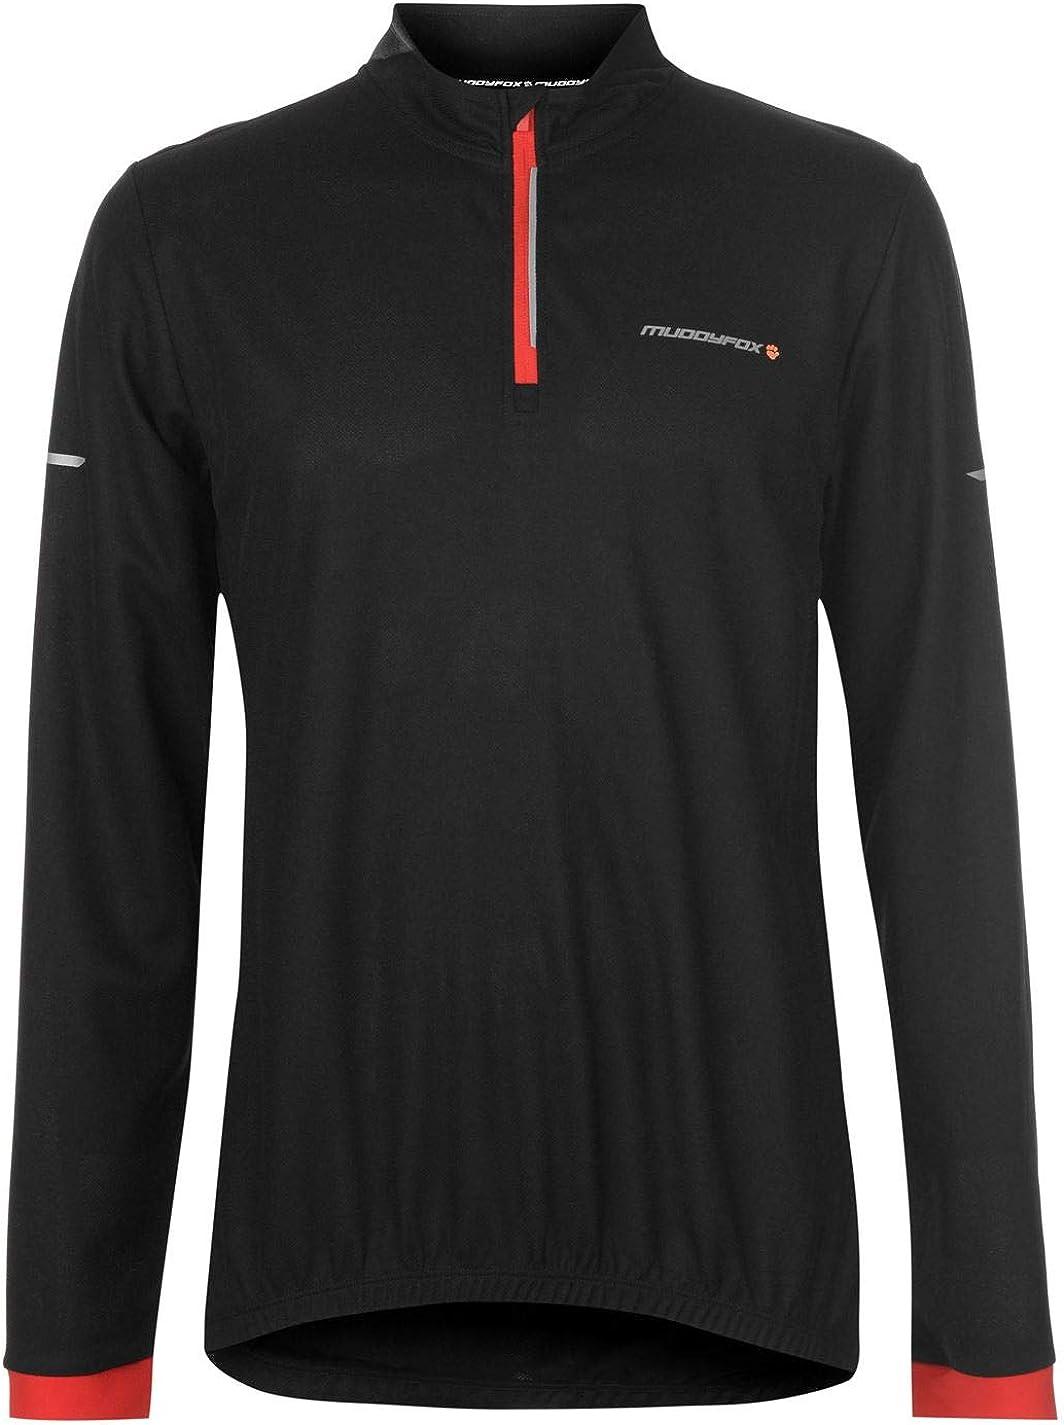 Muddyfox Men/'s Cycling Short-Sleeve Jersey